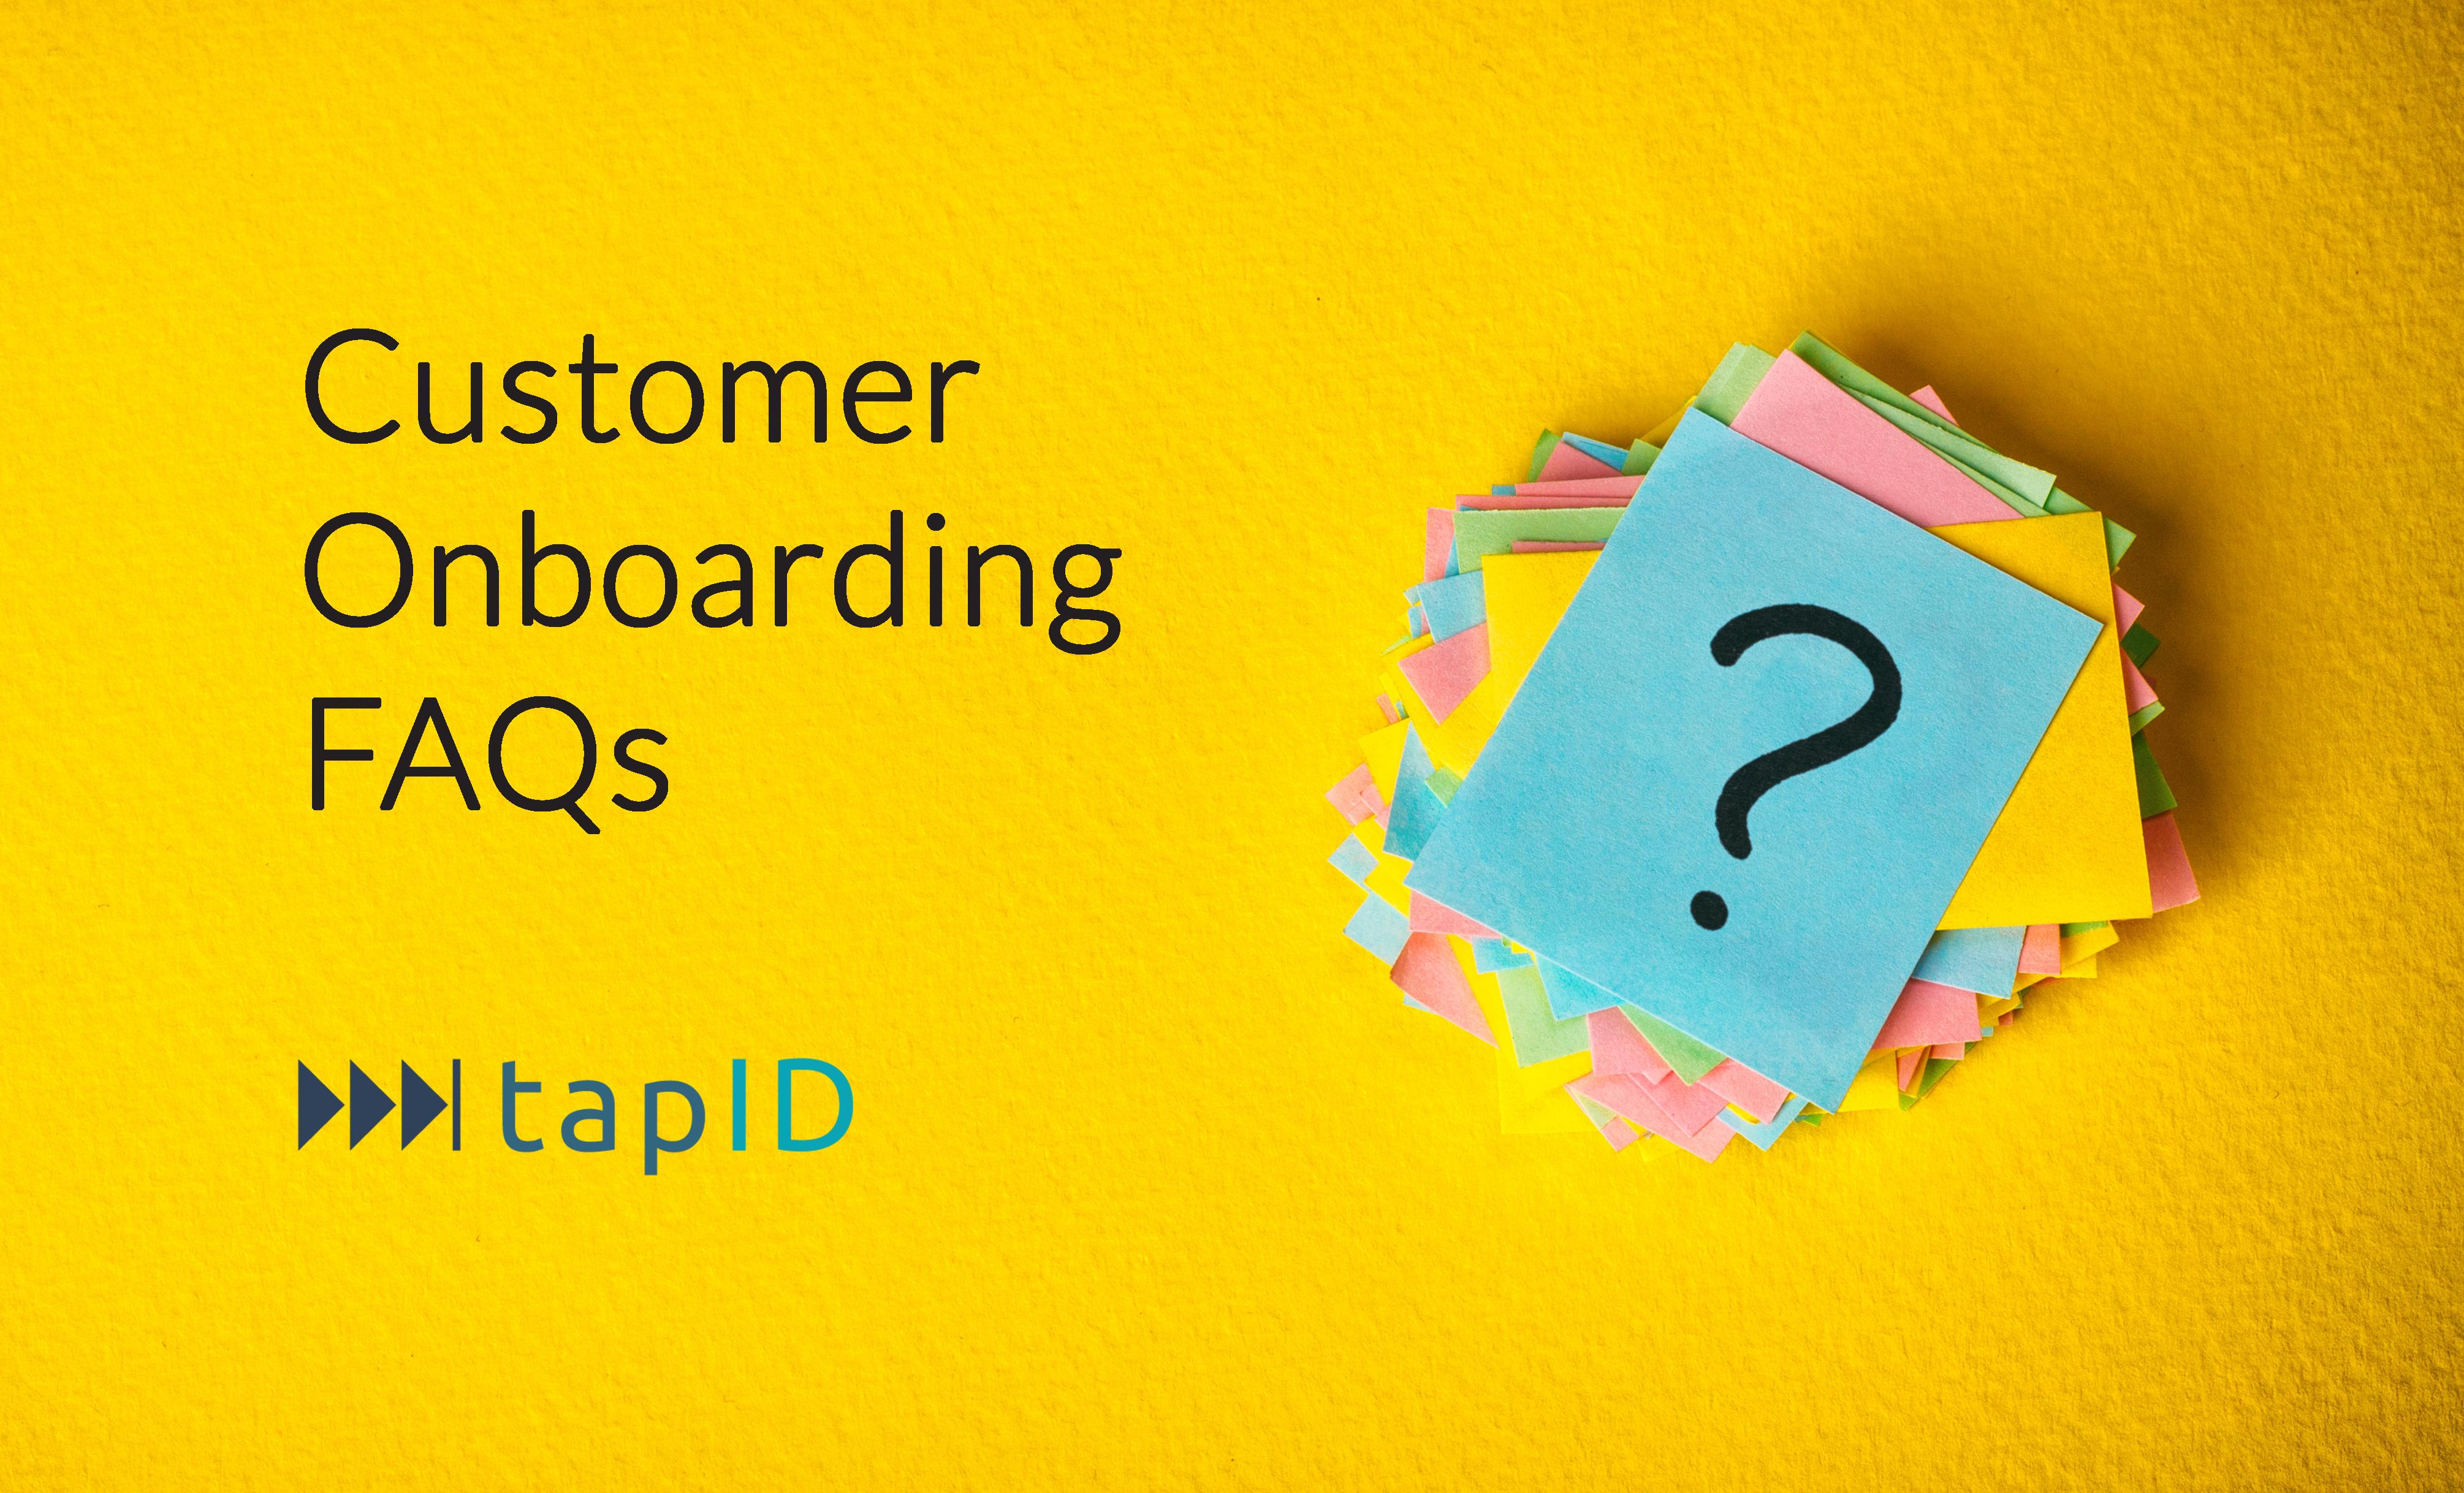 10 Customer Onboarding FAQs